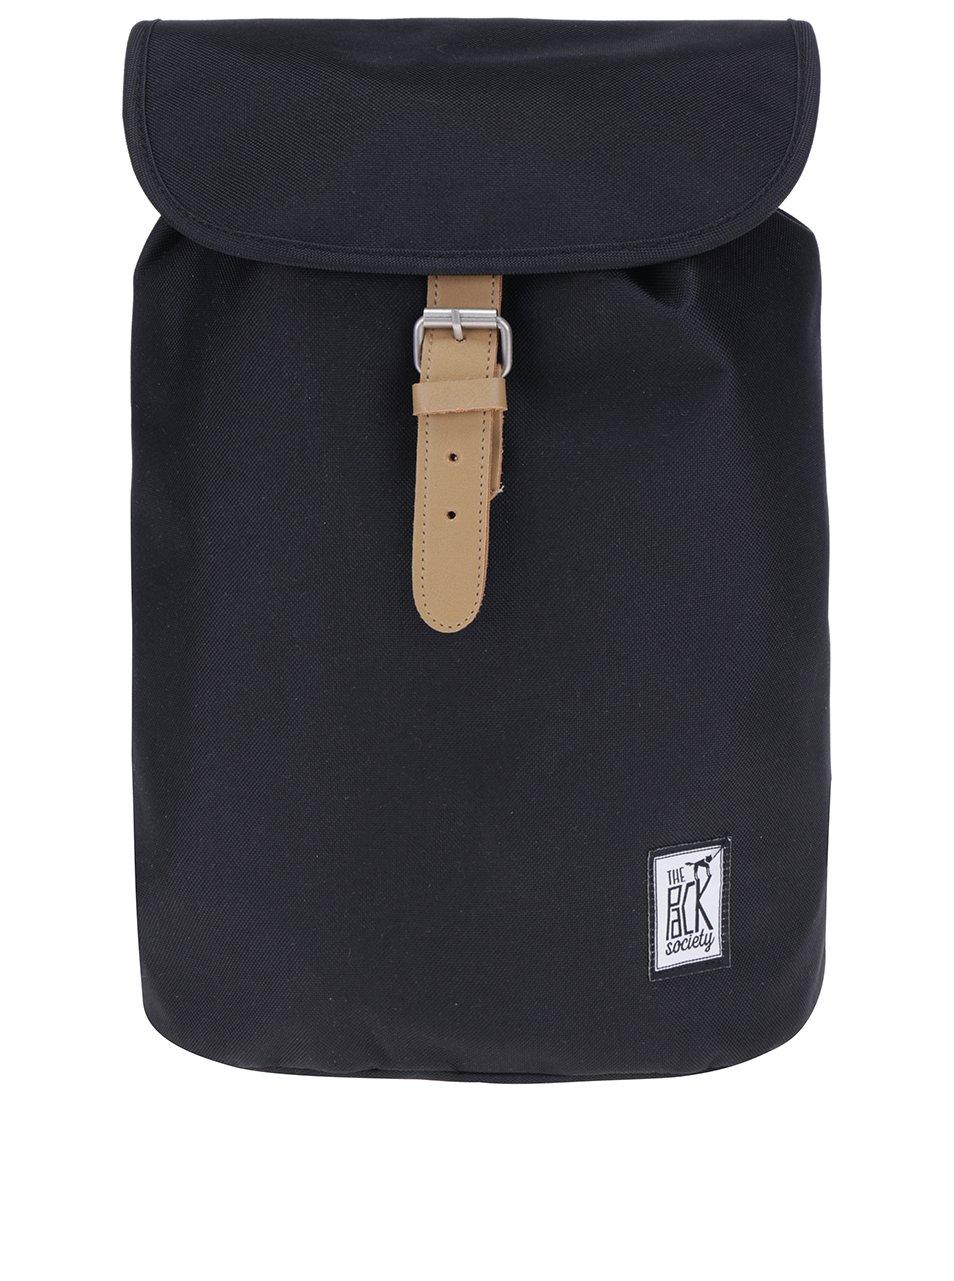 Čierny batoh The Pack Society 10 l